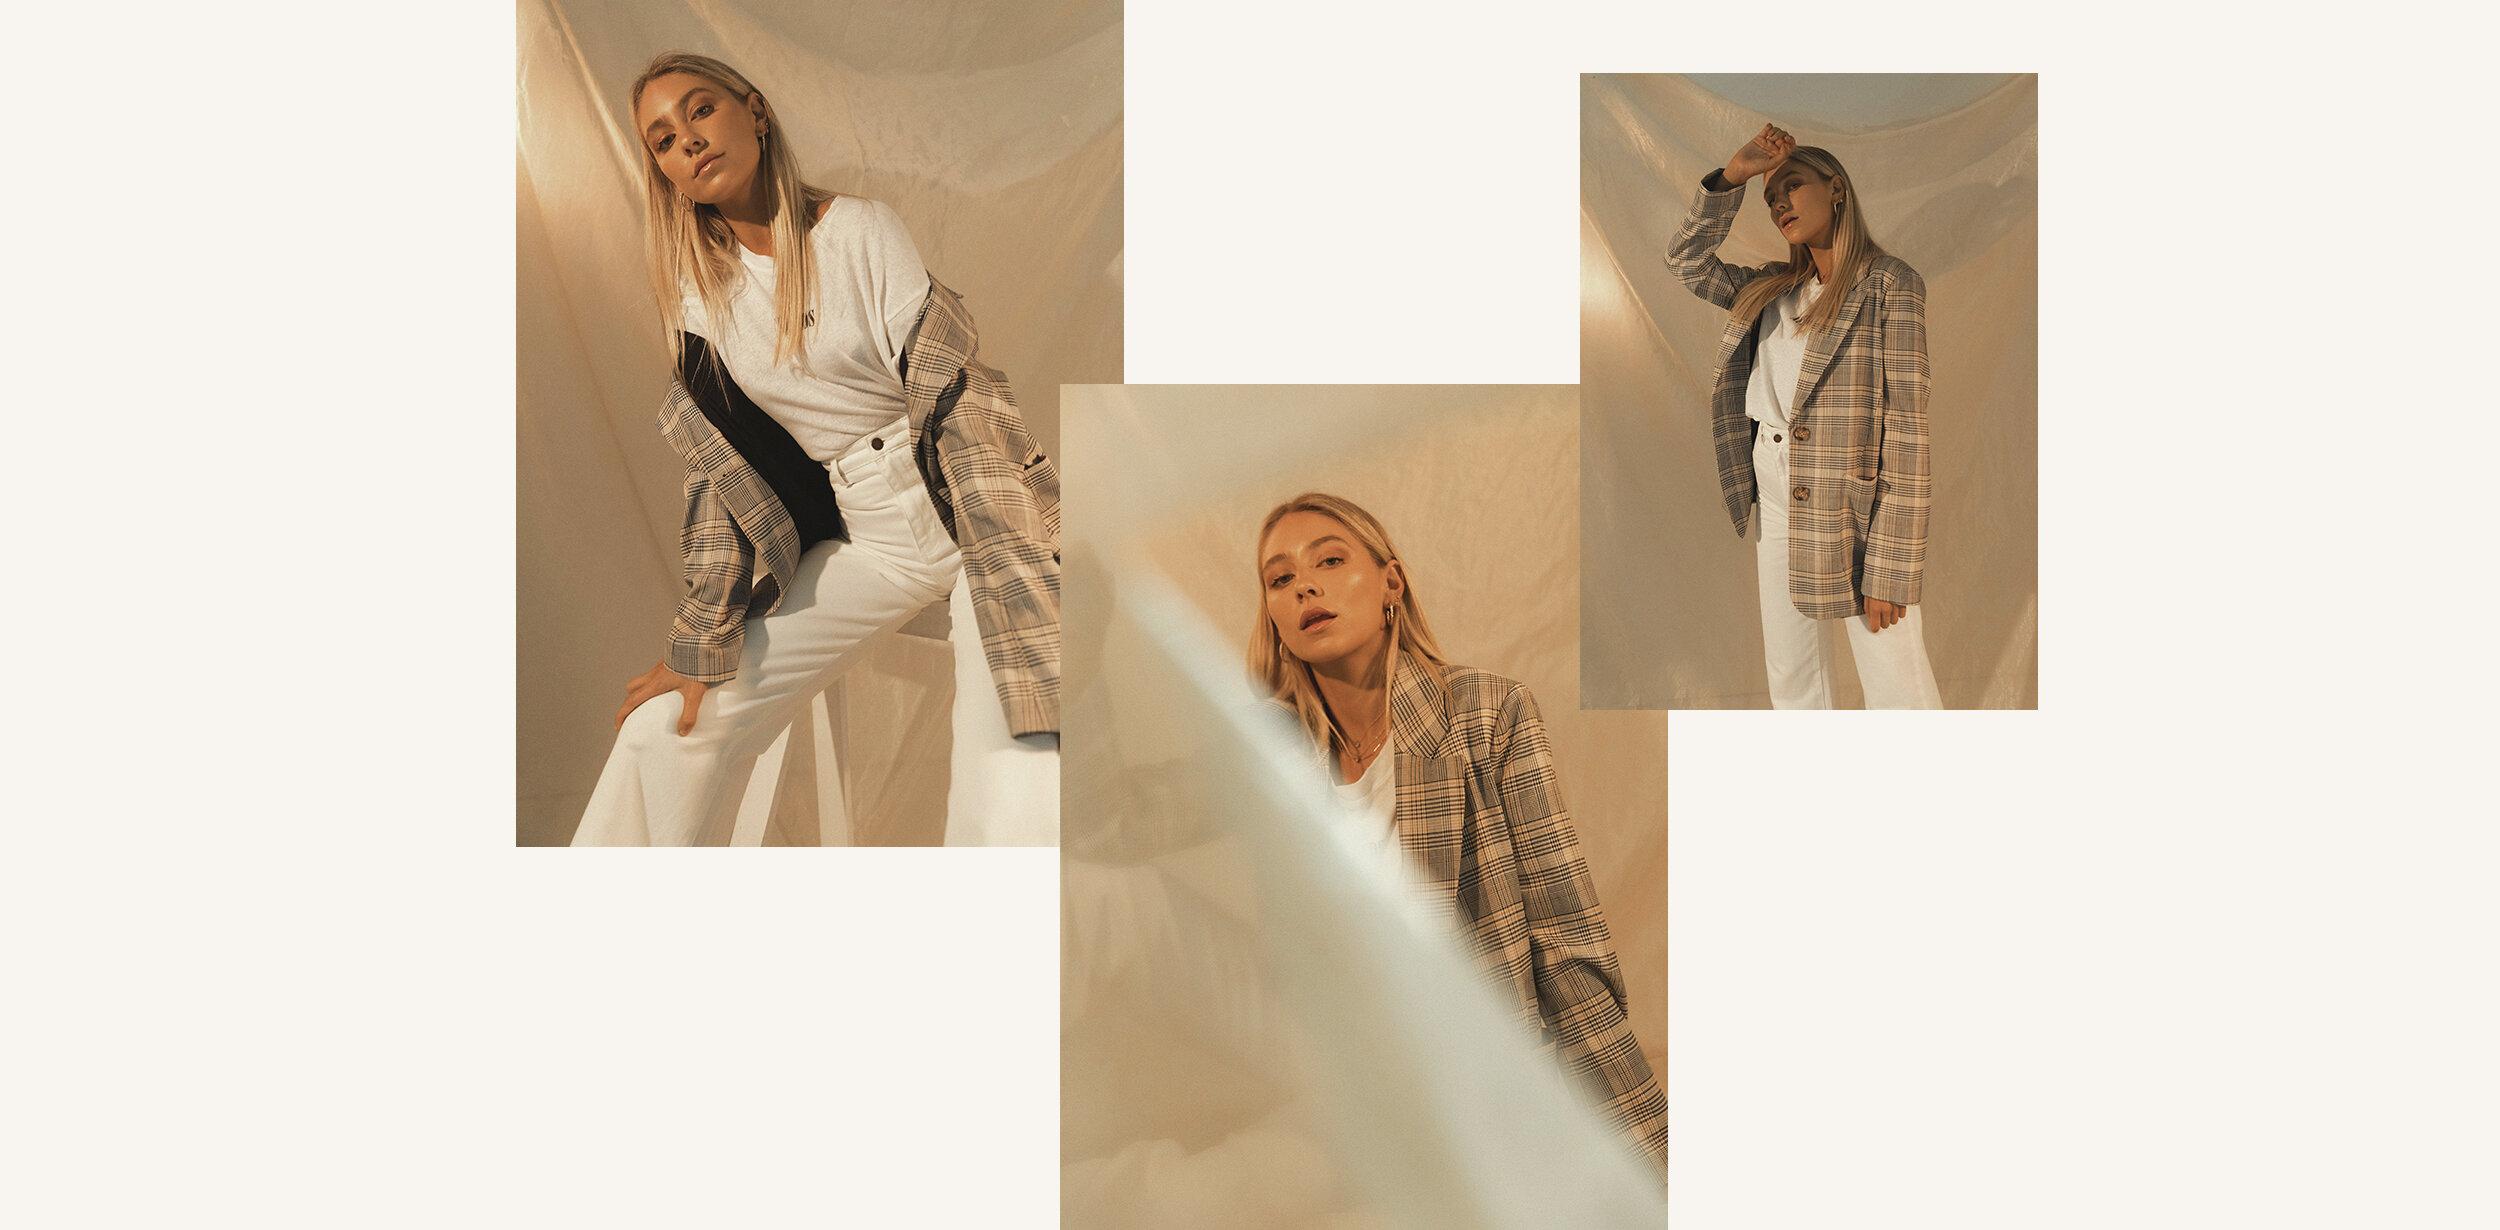 Madison wears the  Landmark Check Blazer,   Courtney Love Hemp Tee  and  Old Mate Jeans.